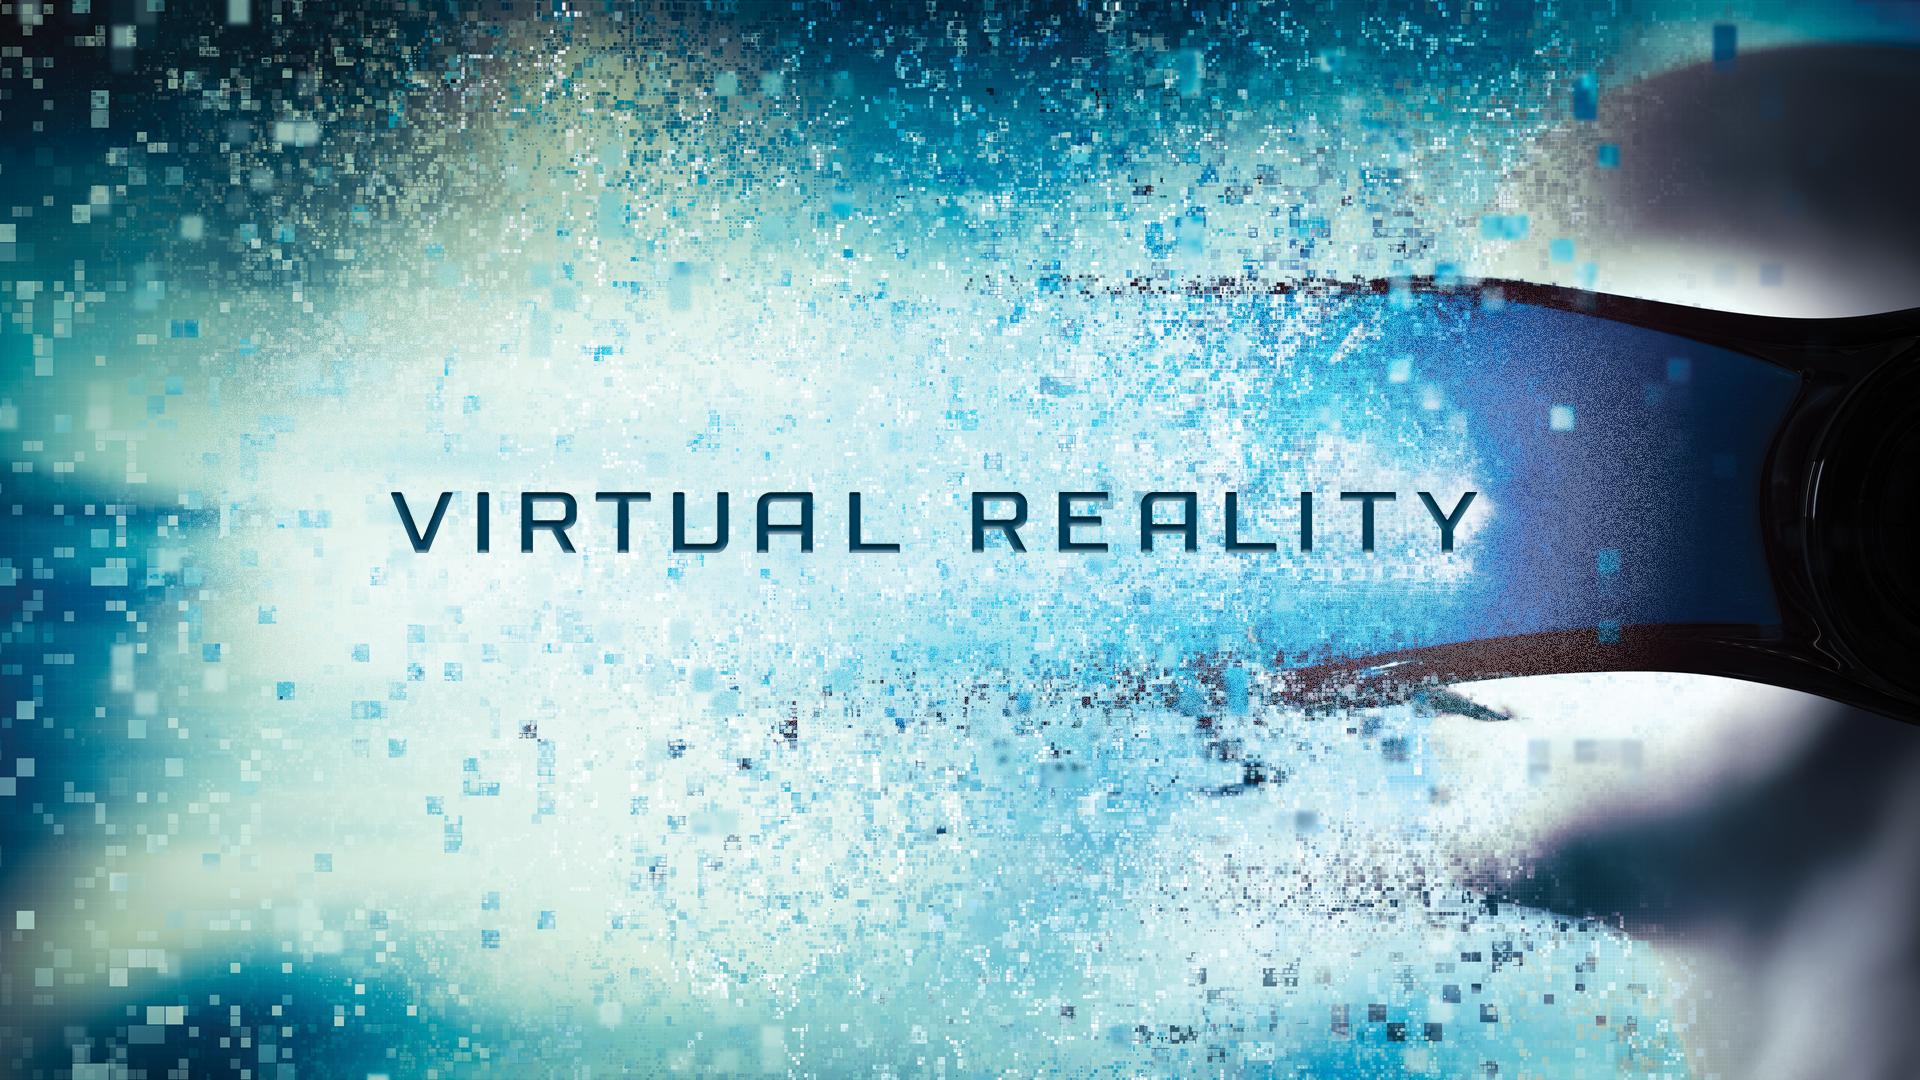 Virtual_Reality_Title_Slide.png